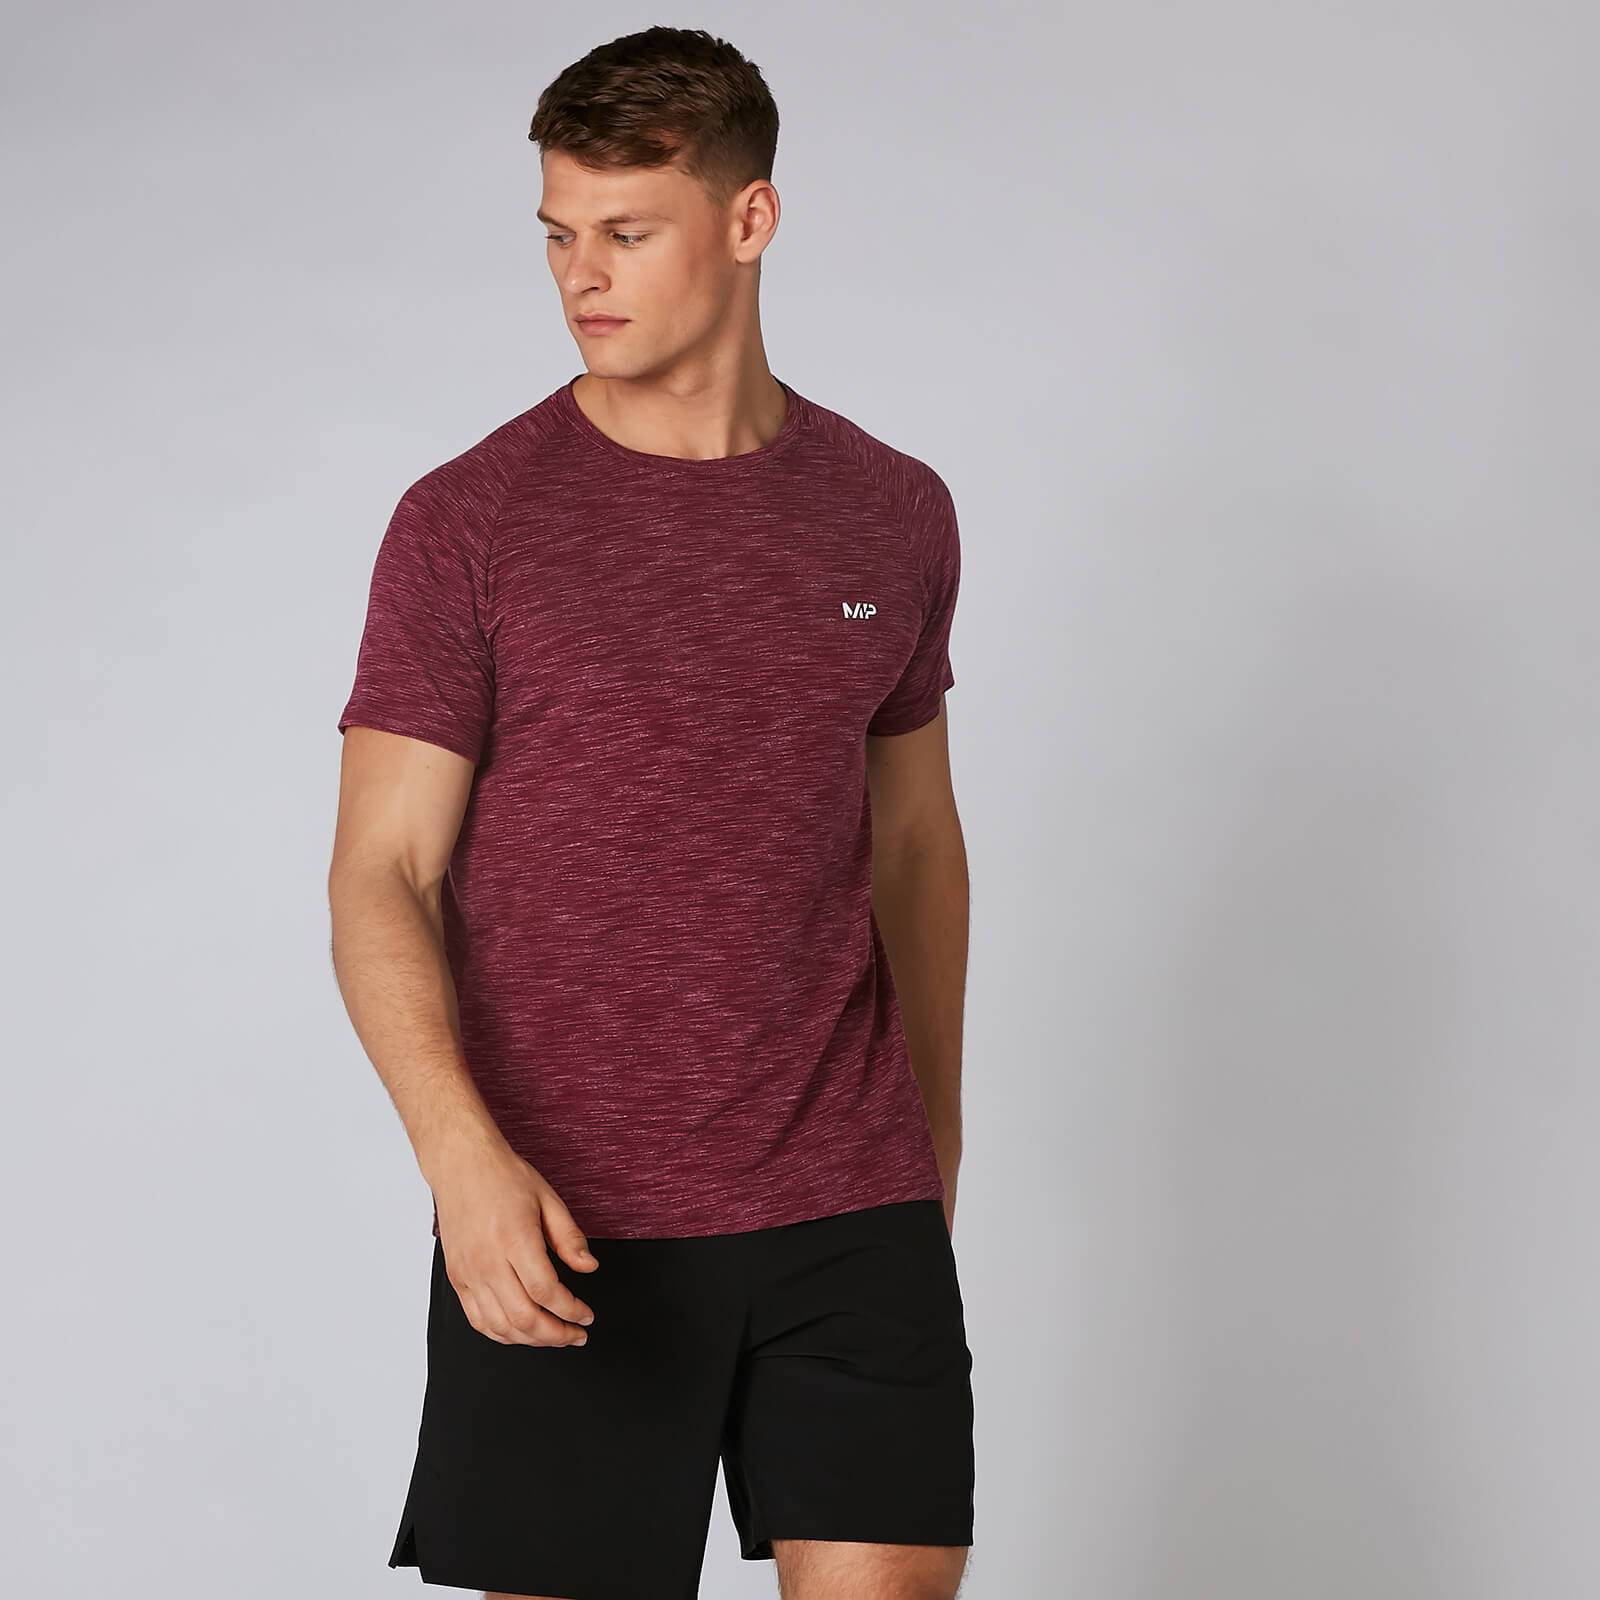 Myprotein MP Performance T-Shirt - Burgundy Marl - L